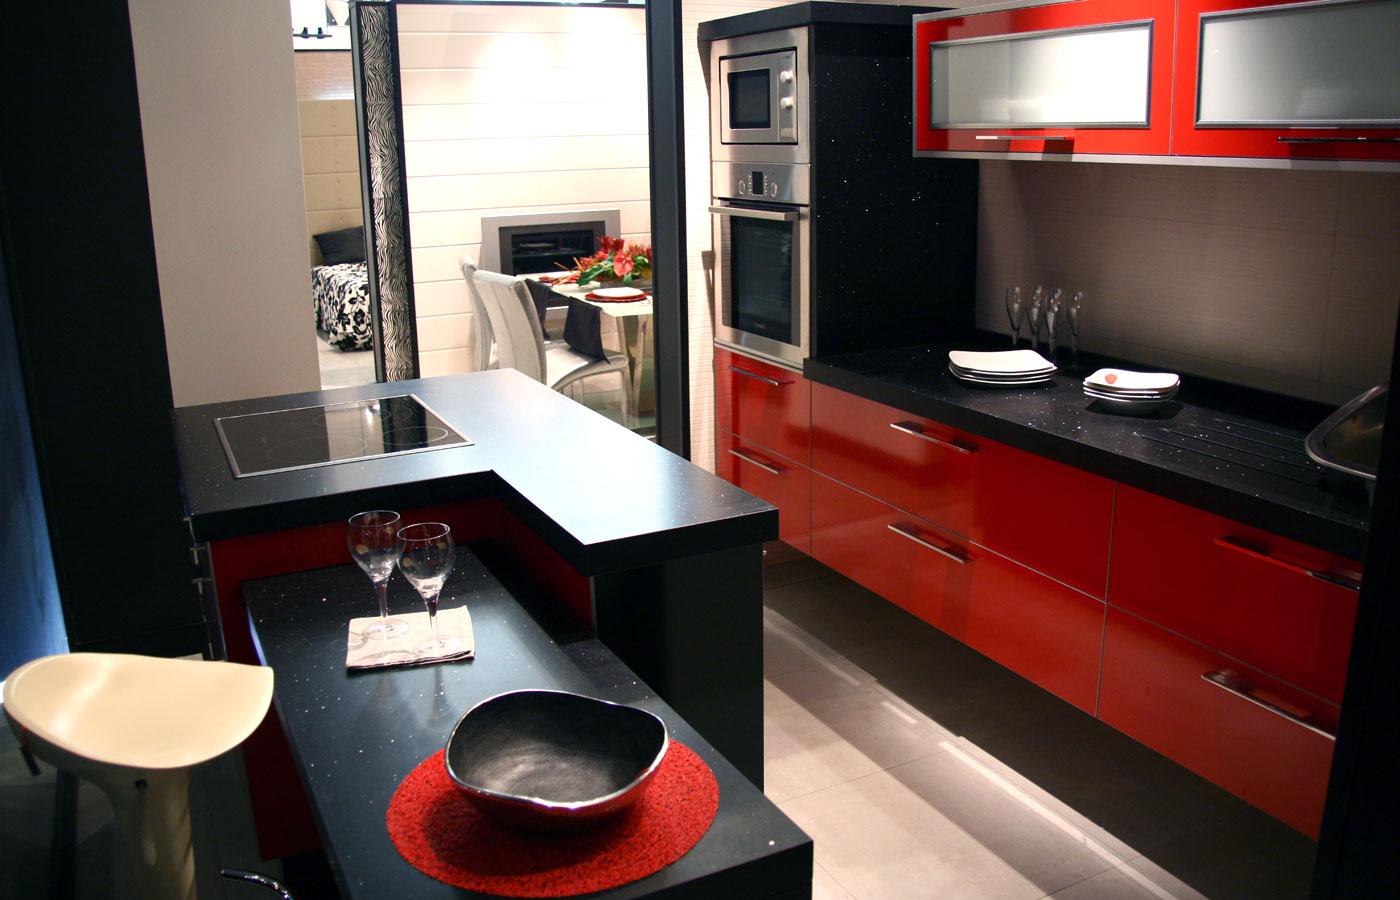 como construir una cocina moderna